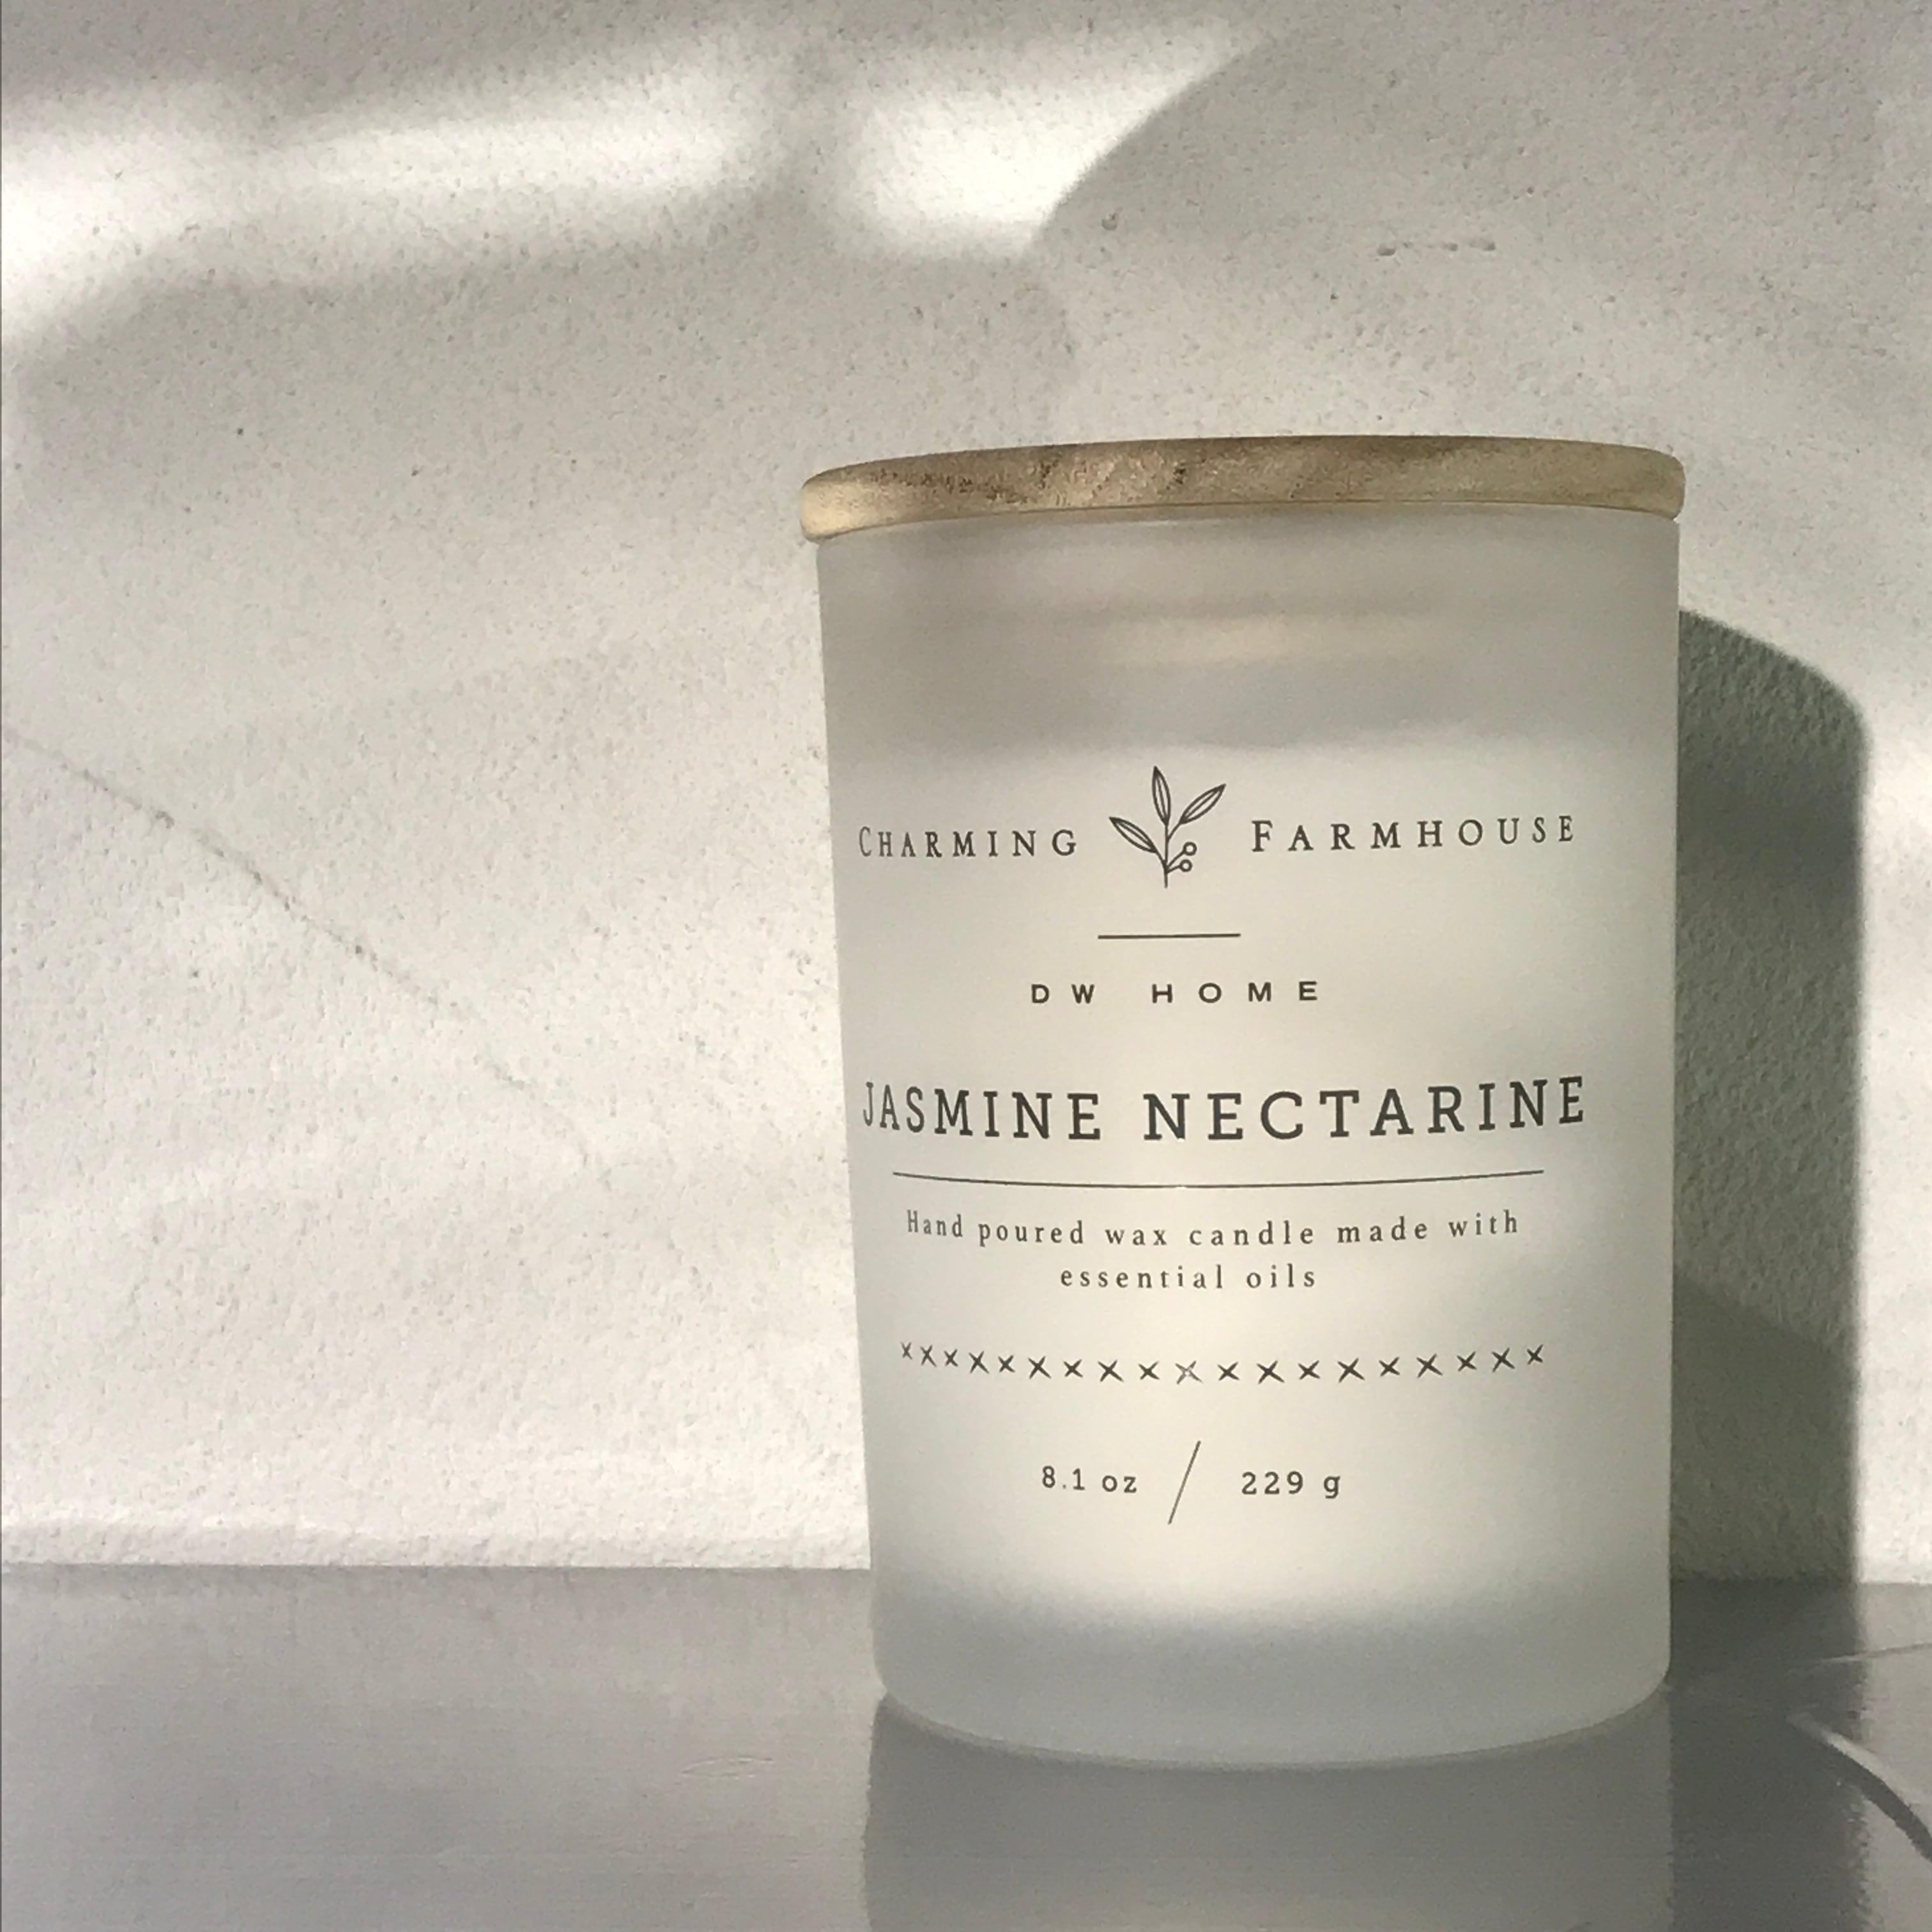 【DW Home Candles】JASMINE NECTARINE【アロマキャンドル】